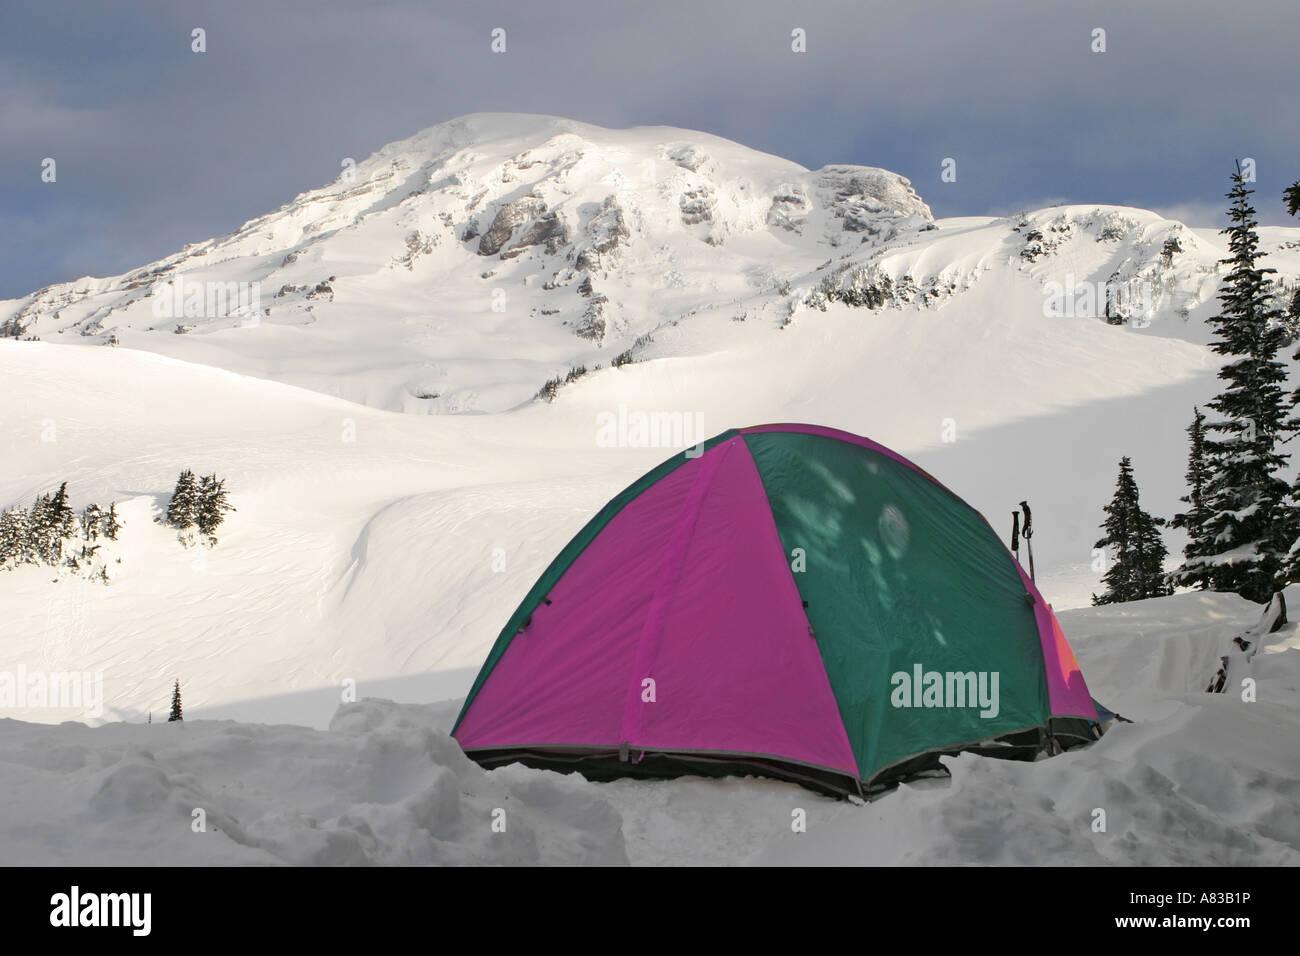 C&ing Tent On Mt. Rainier & Camping Tent On Mt. Rainier Stock Photo Royalty Free Image ...